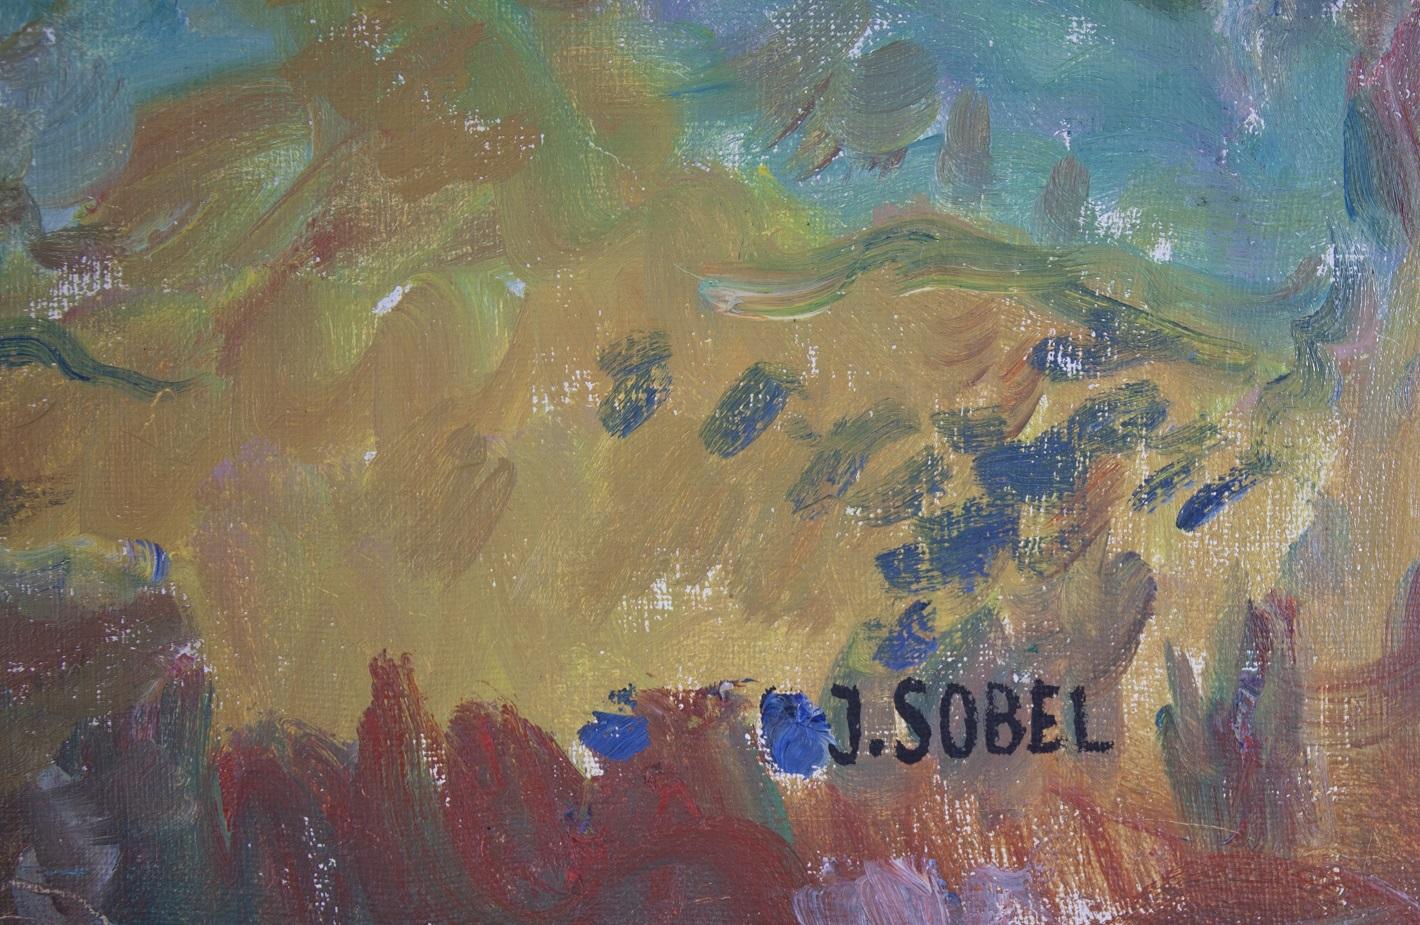 Sobel Judyta (1924-2012), Pejzaż